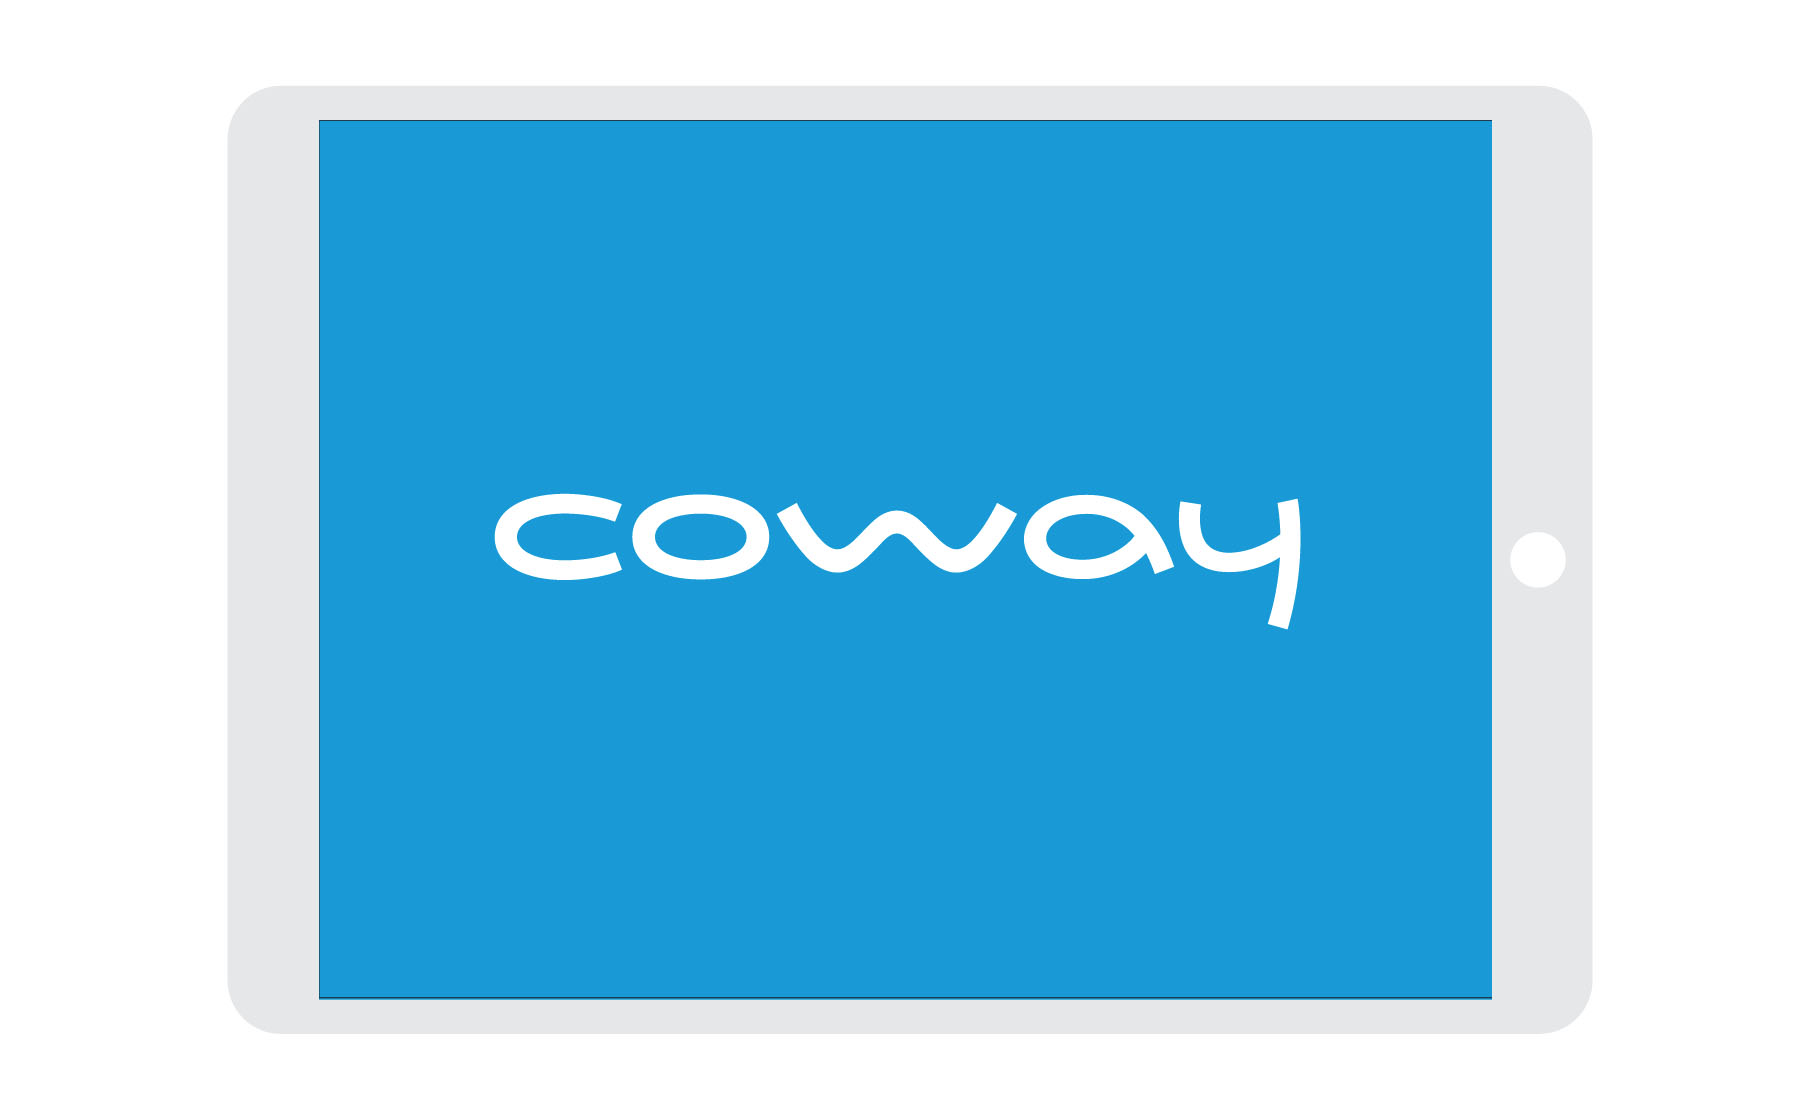 coway11.jpg